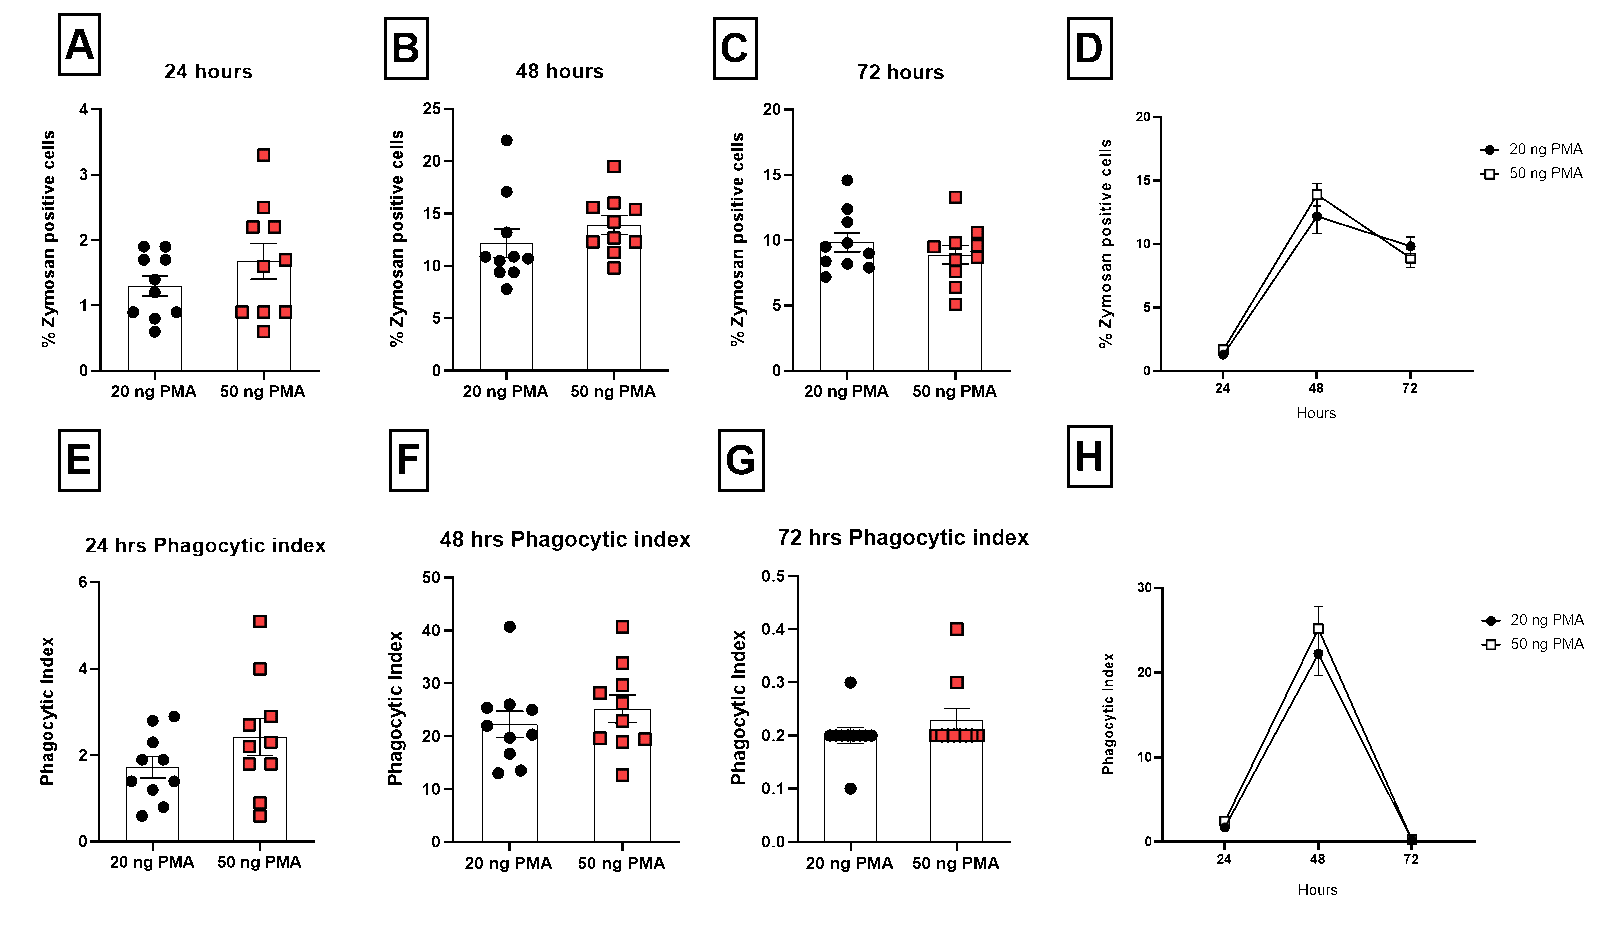 Phagocytosis assay using THP-1 cells- cont.